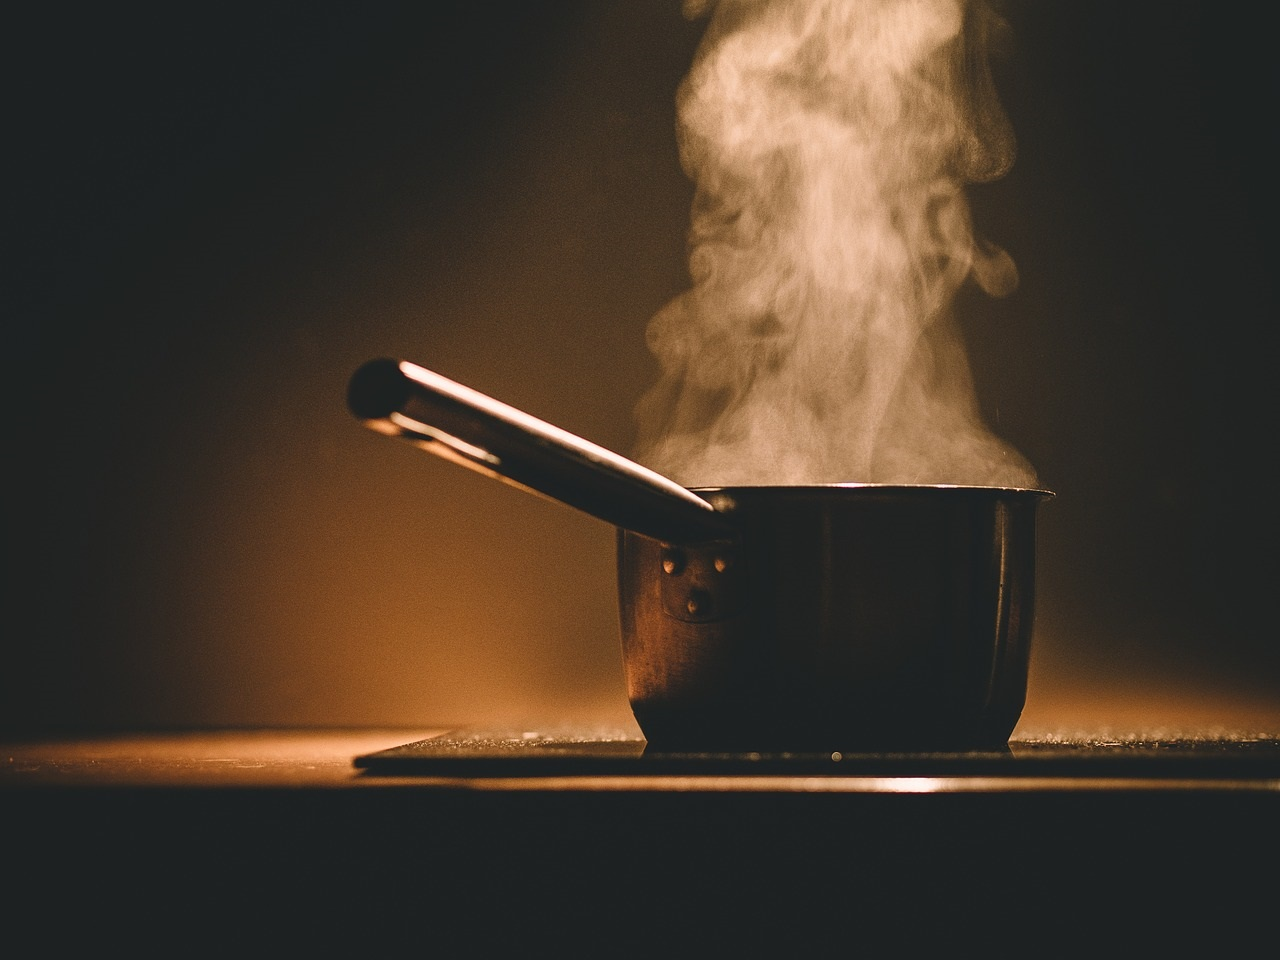 Les différentes sortes de casseroles